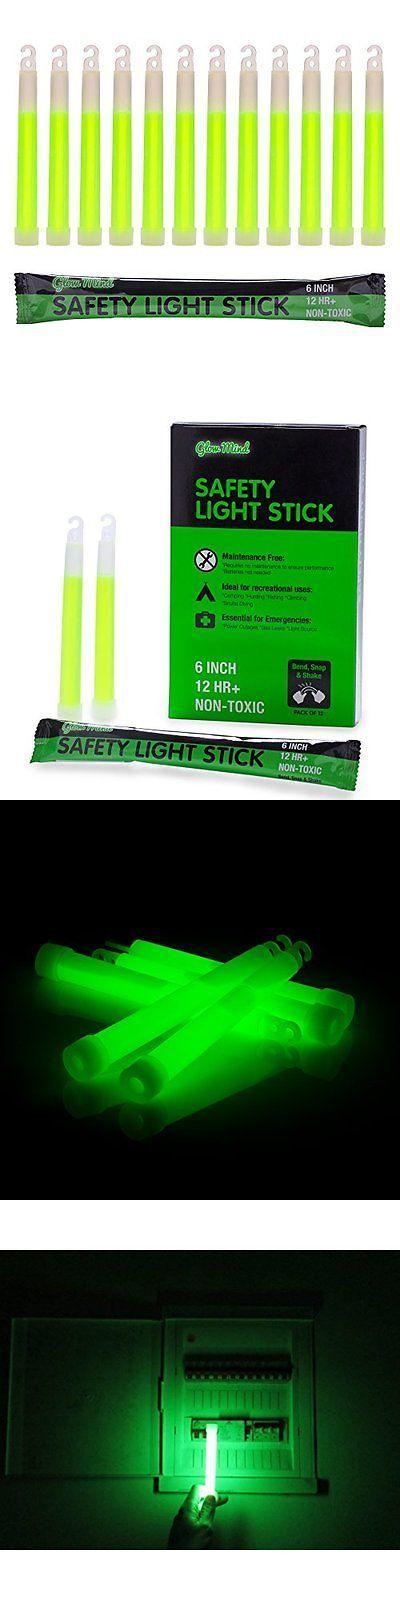 Glow Sticks 159091: 12 Emergency Light Sticks Industrial Grade Glow Sticks, 6 Ultra Bright Light -> BUY IT NOW ONLY: $33.1 on eBay!